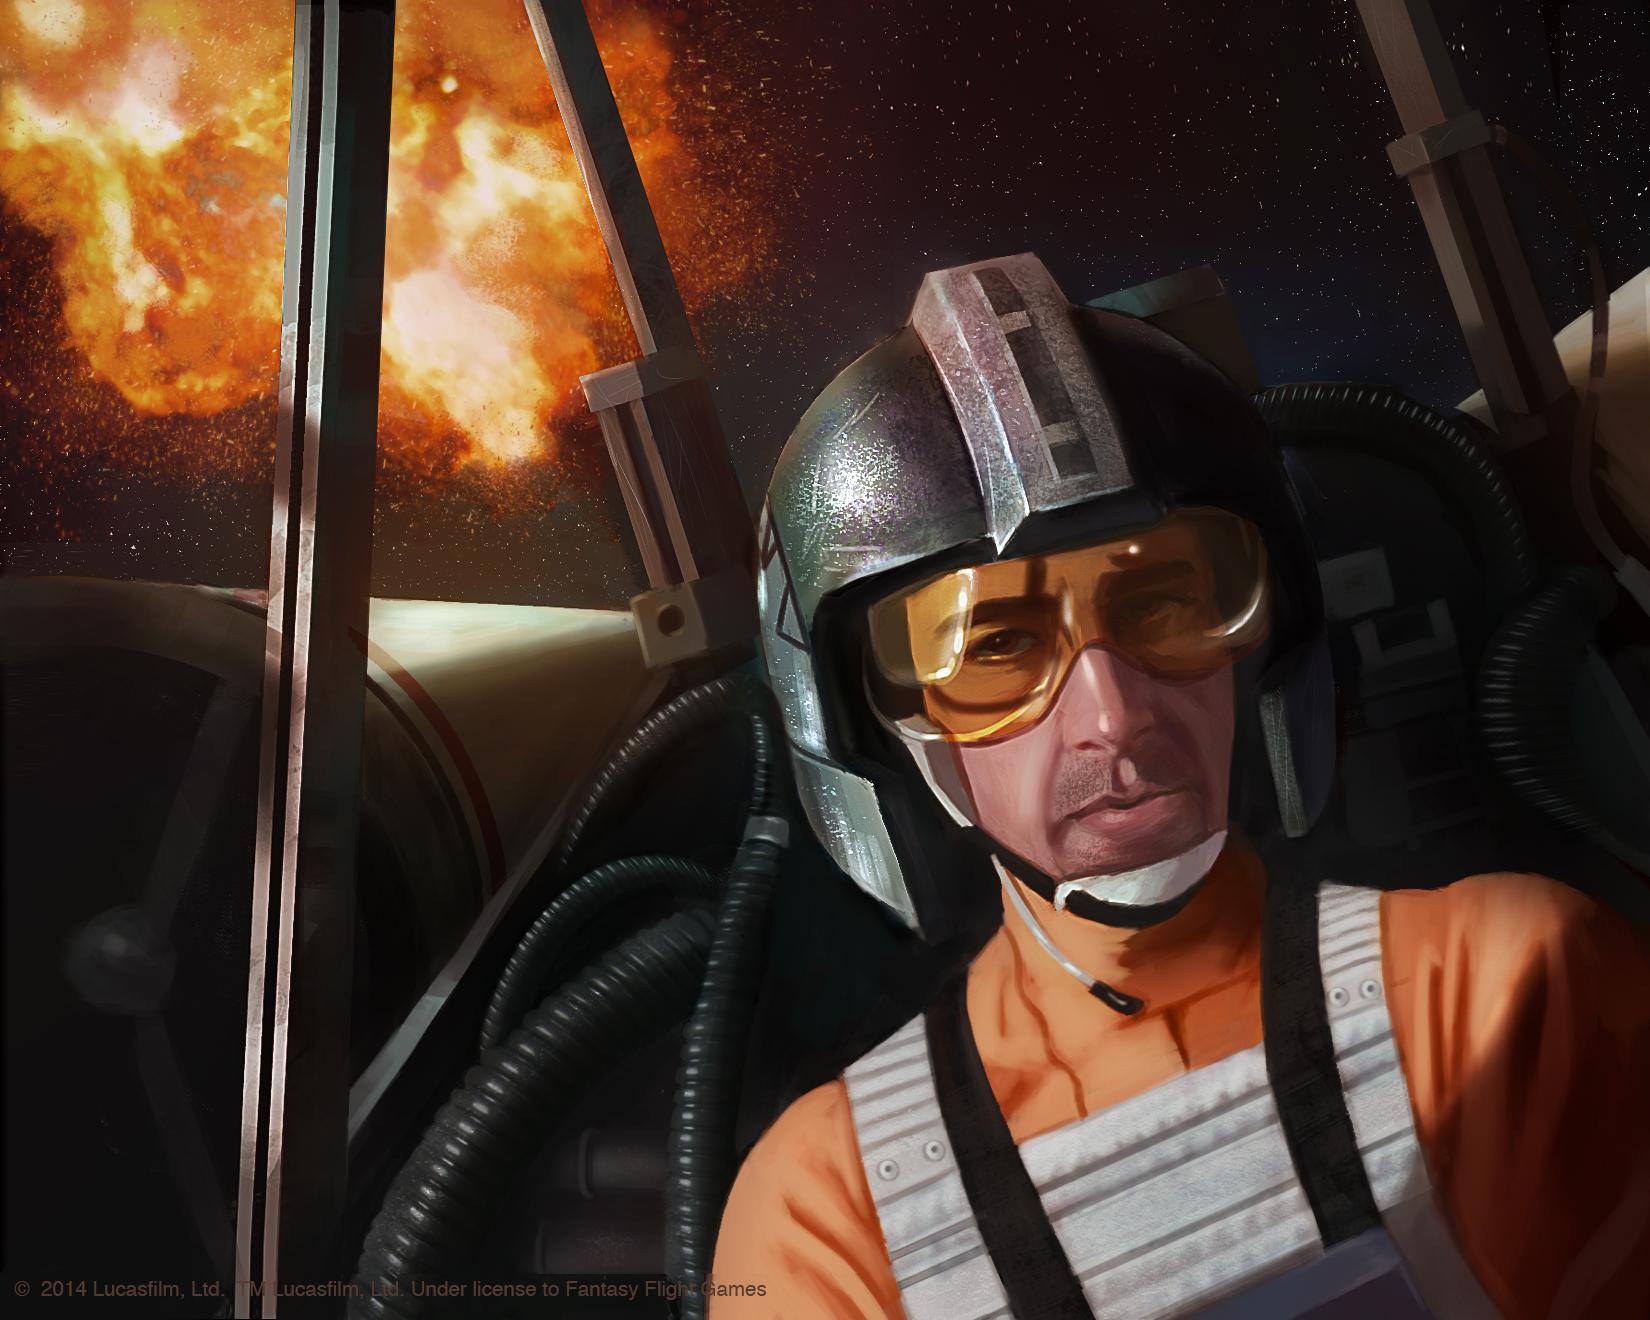 Star_Wars_WedgeAntilles_JorgeBarrero.jpg